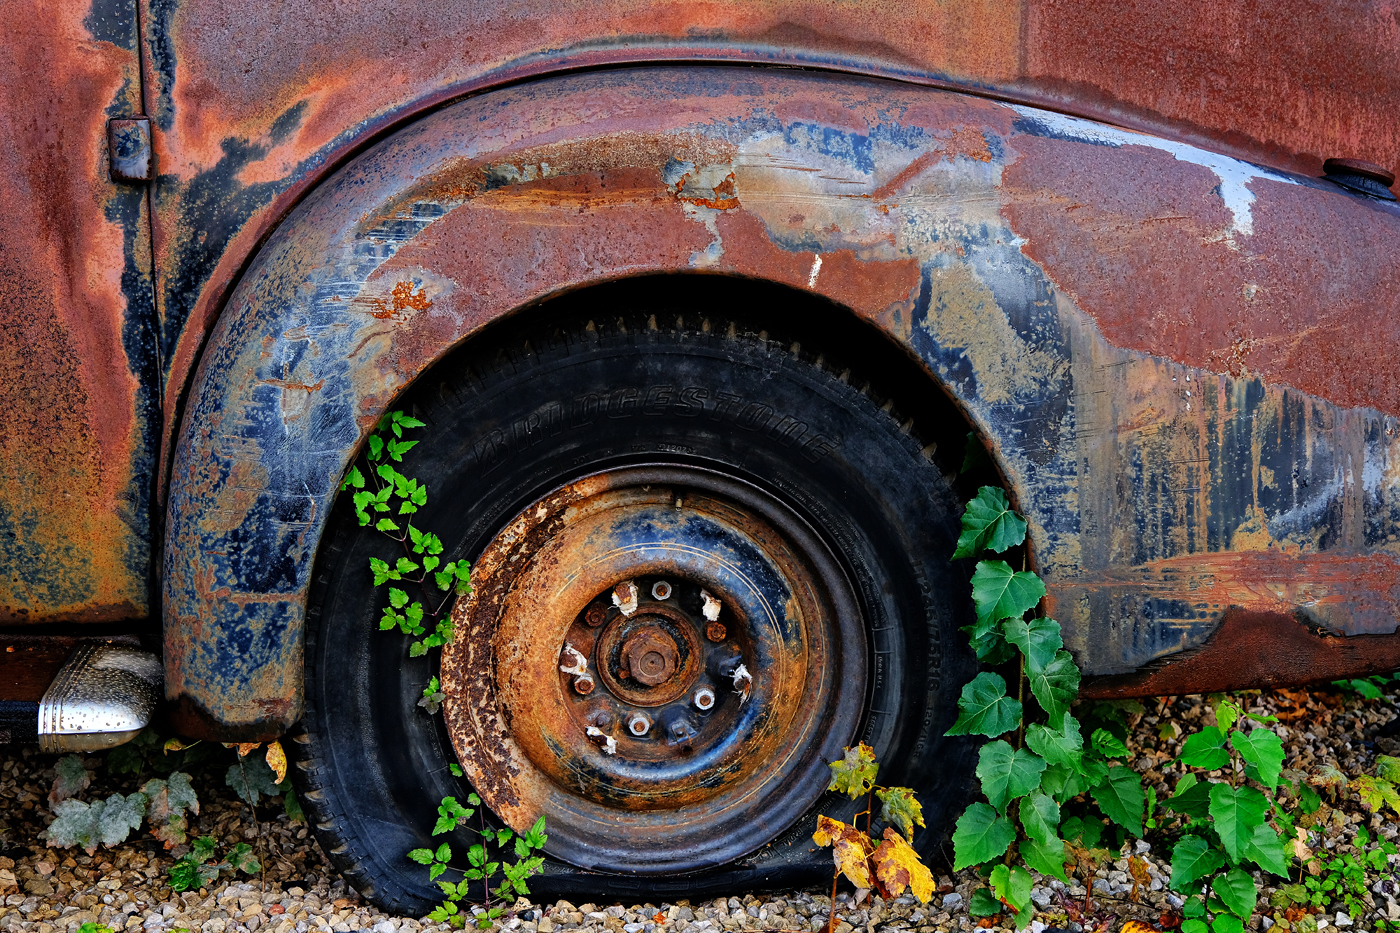 Rusty Caddy | © Günter Brombach